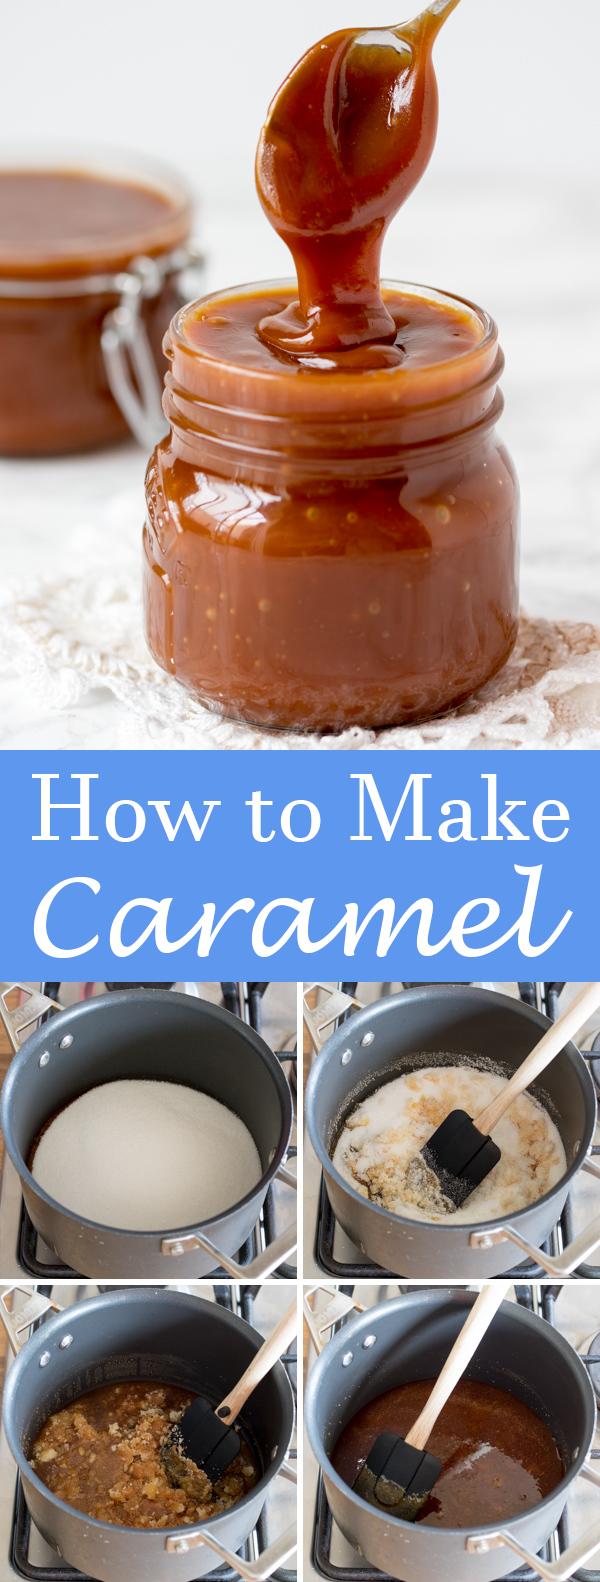 how to make caramel pin